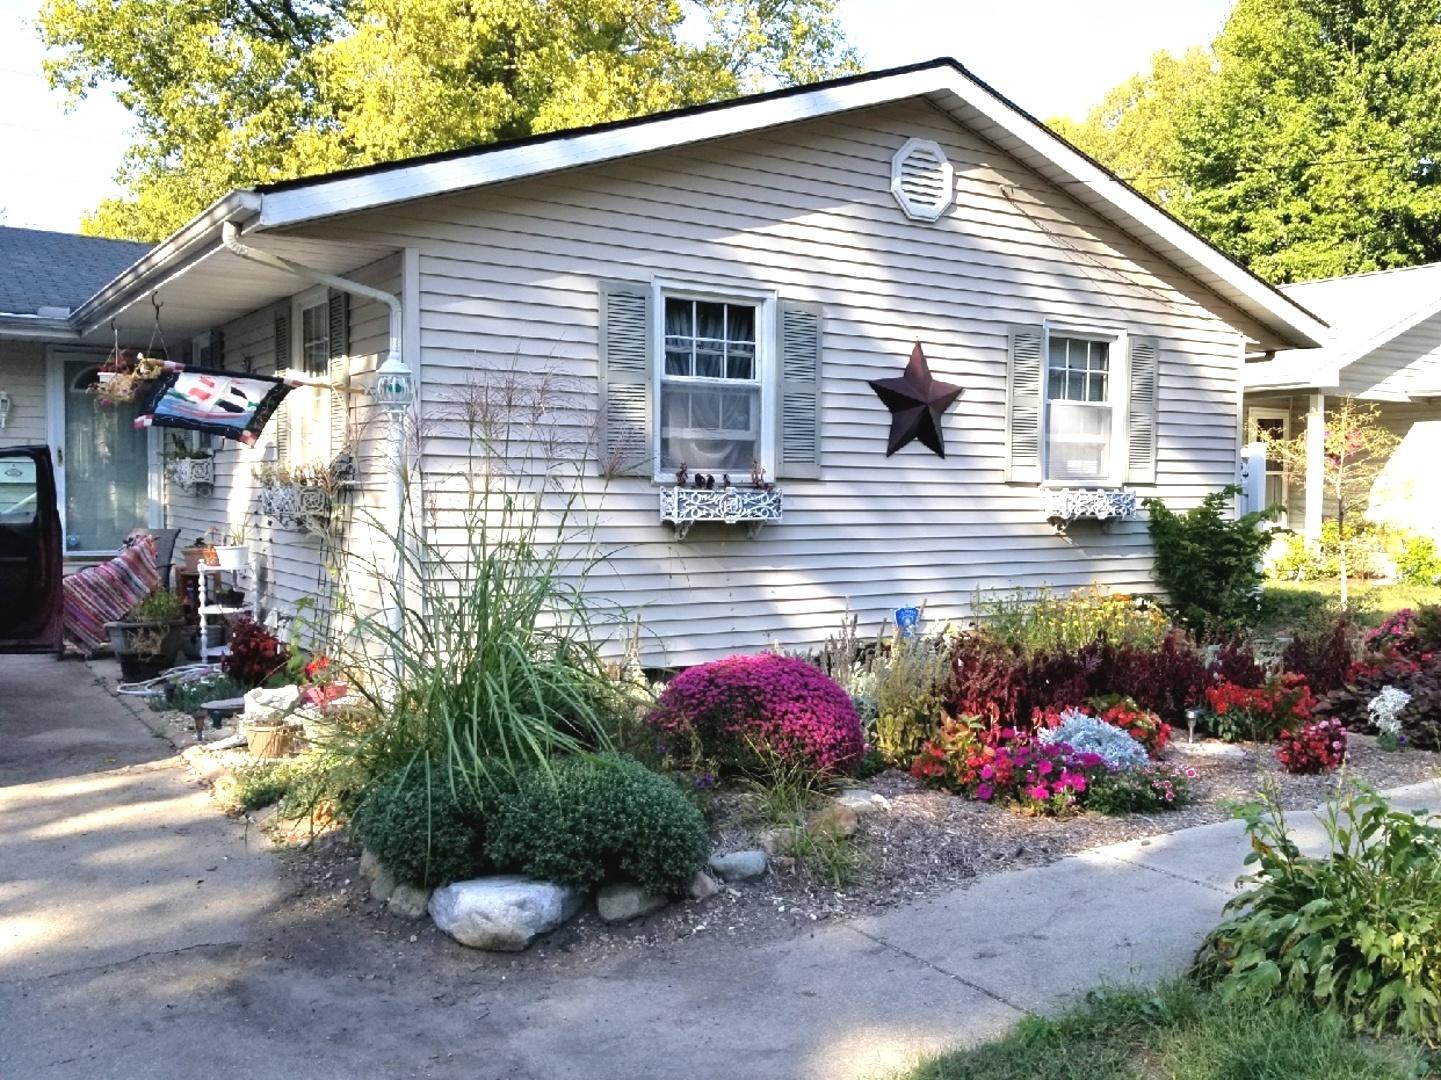 808 East HIGH, Monticello, Illinois, 61856